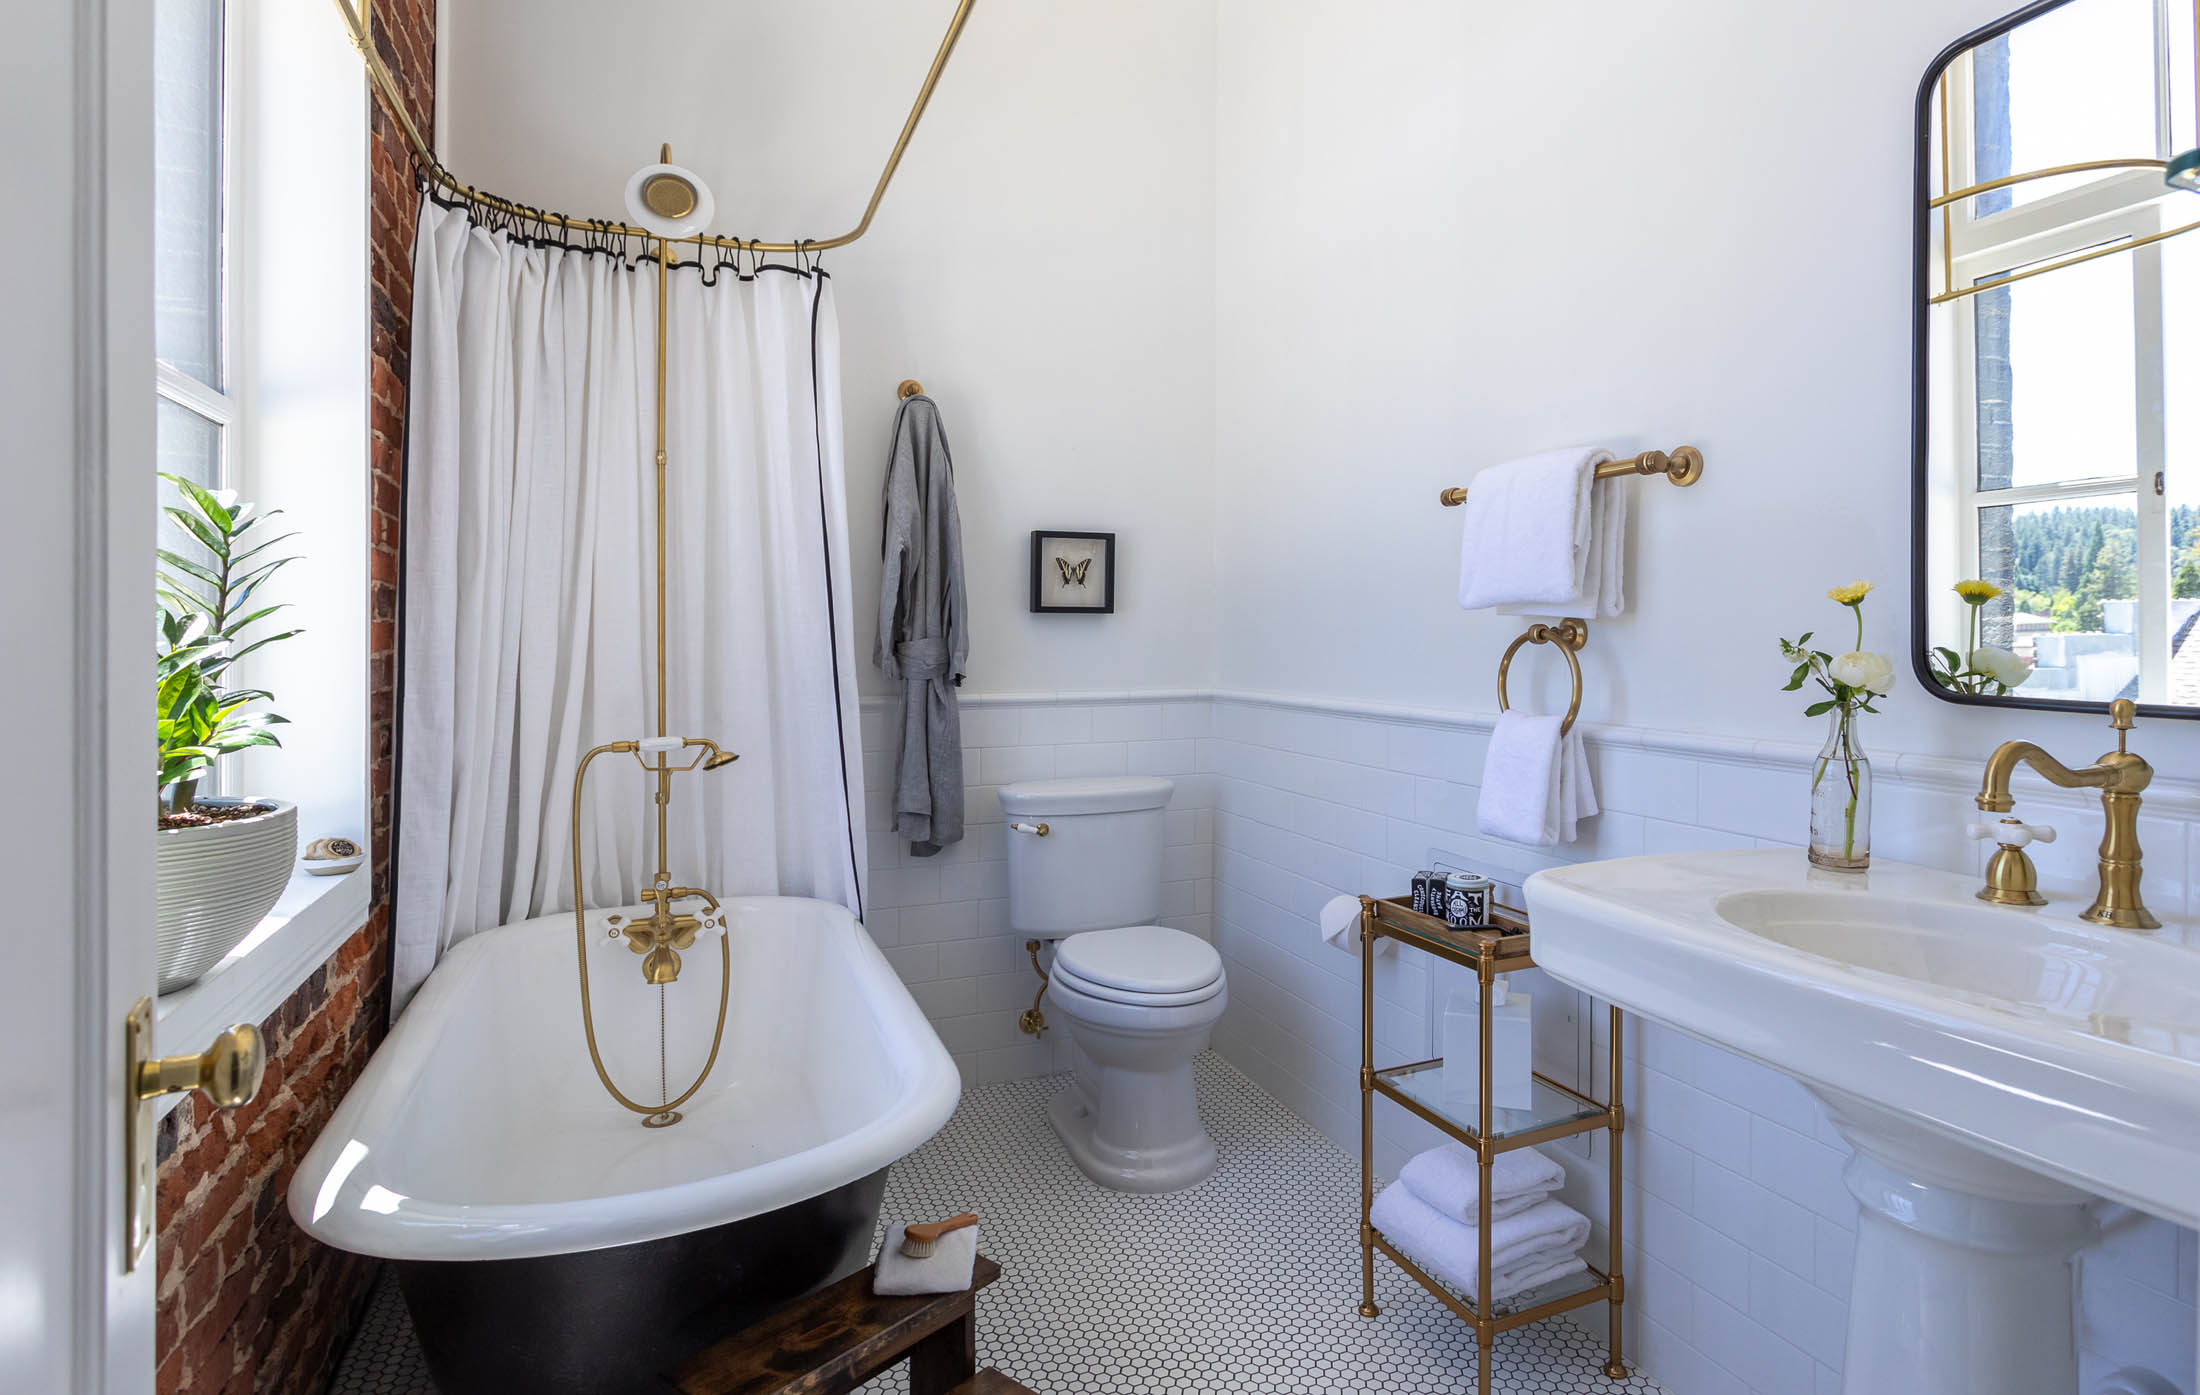 Holbrooke Hotel Bathroom